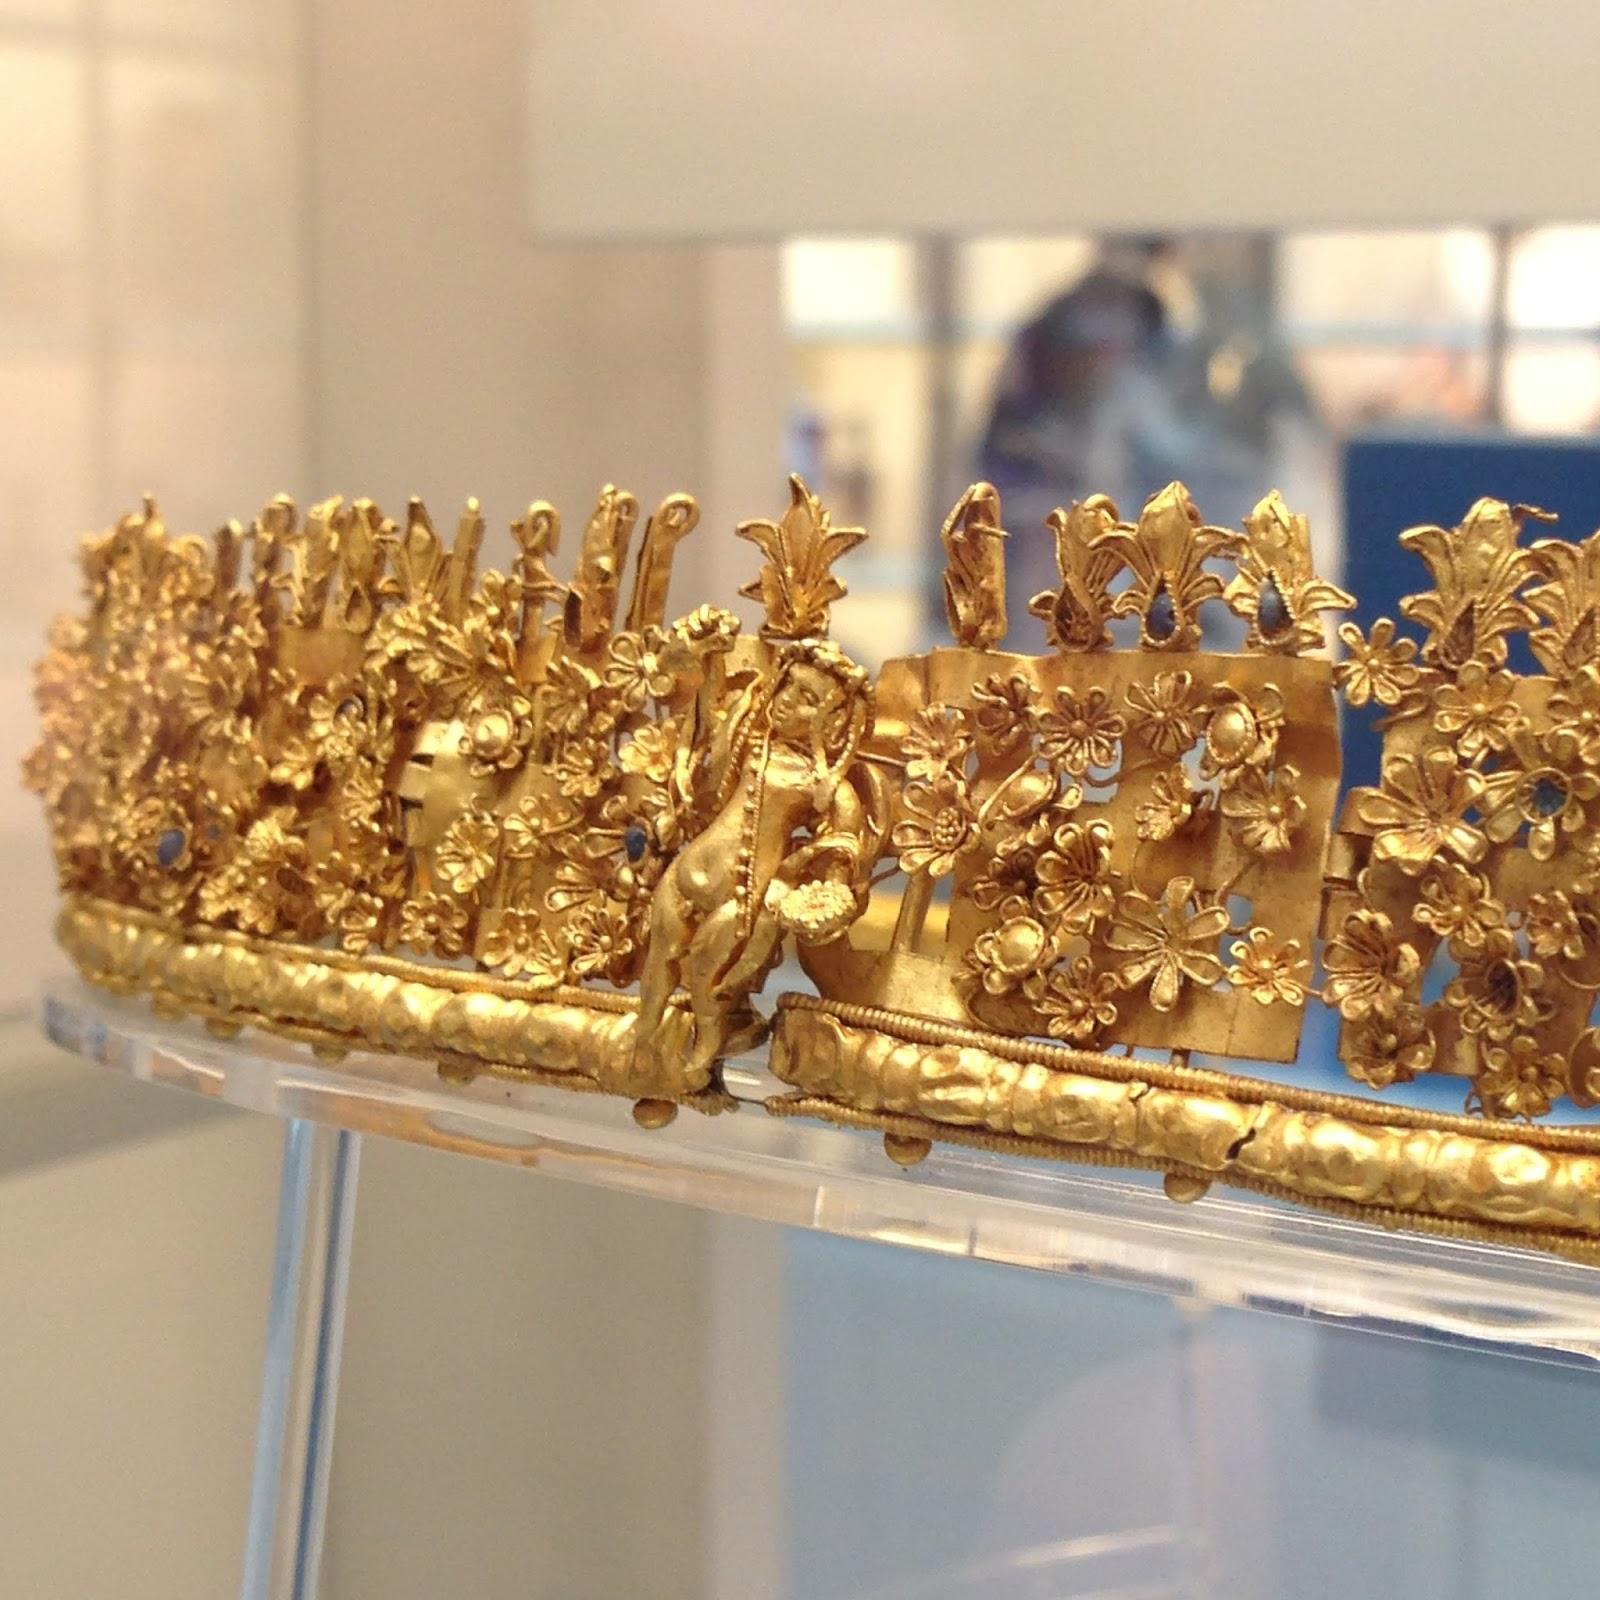 Niky Sayers Artisan Jewellery: Ancient Jewellery, The British ...